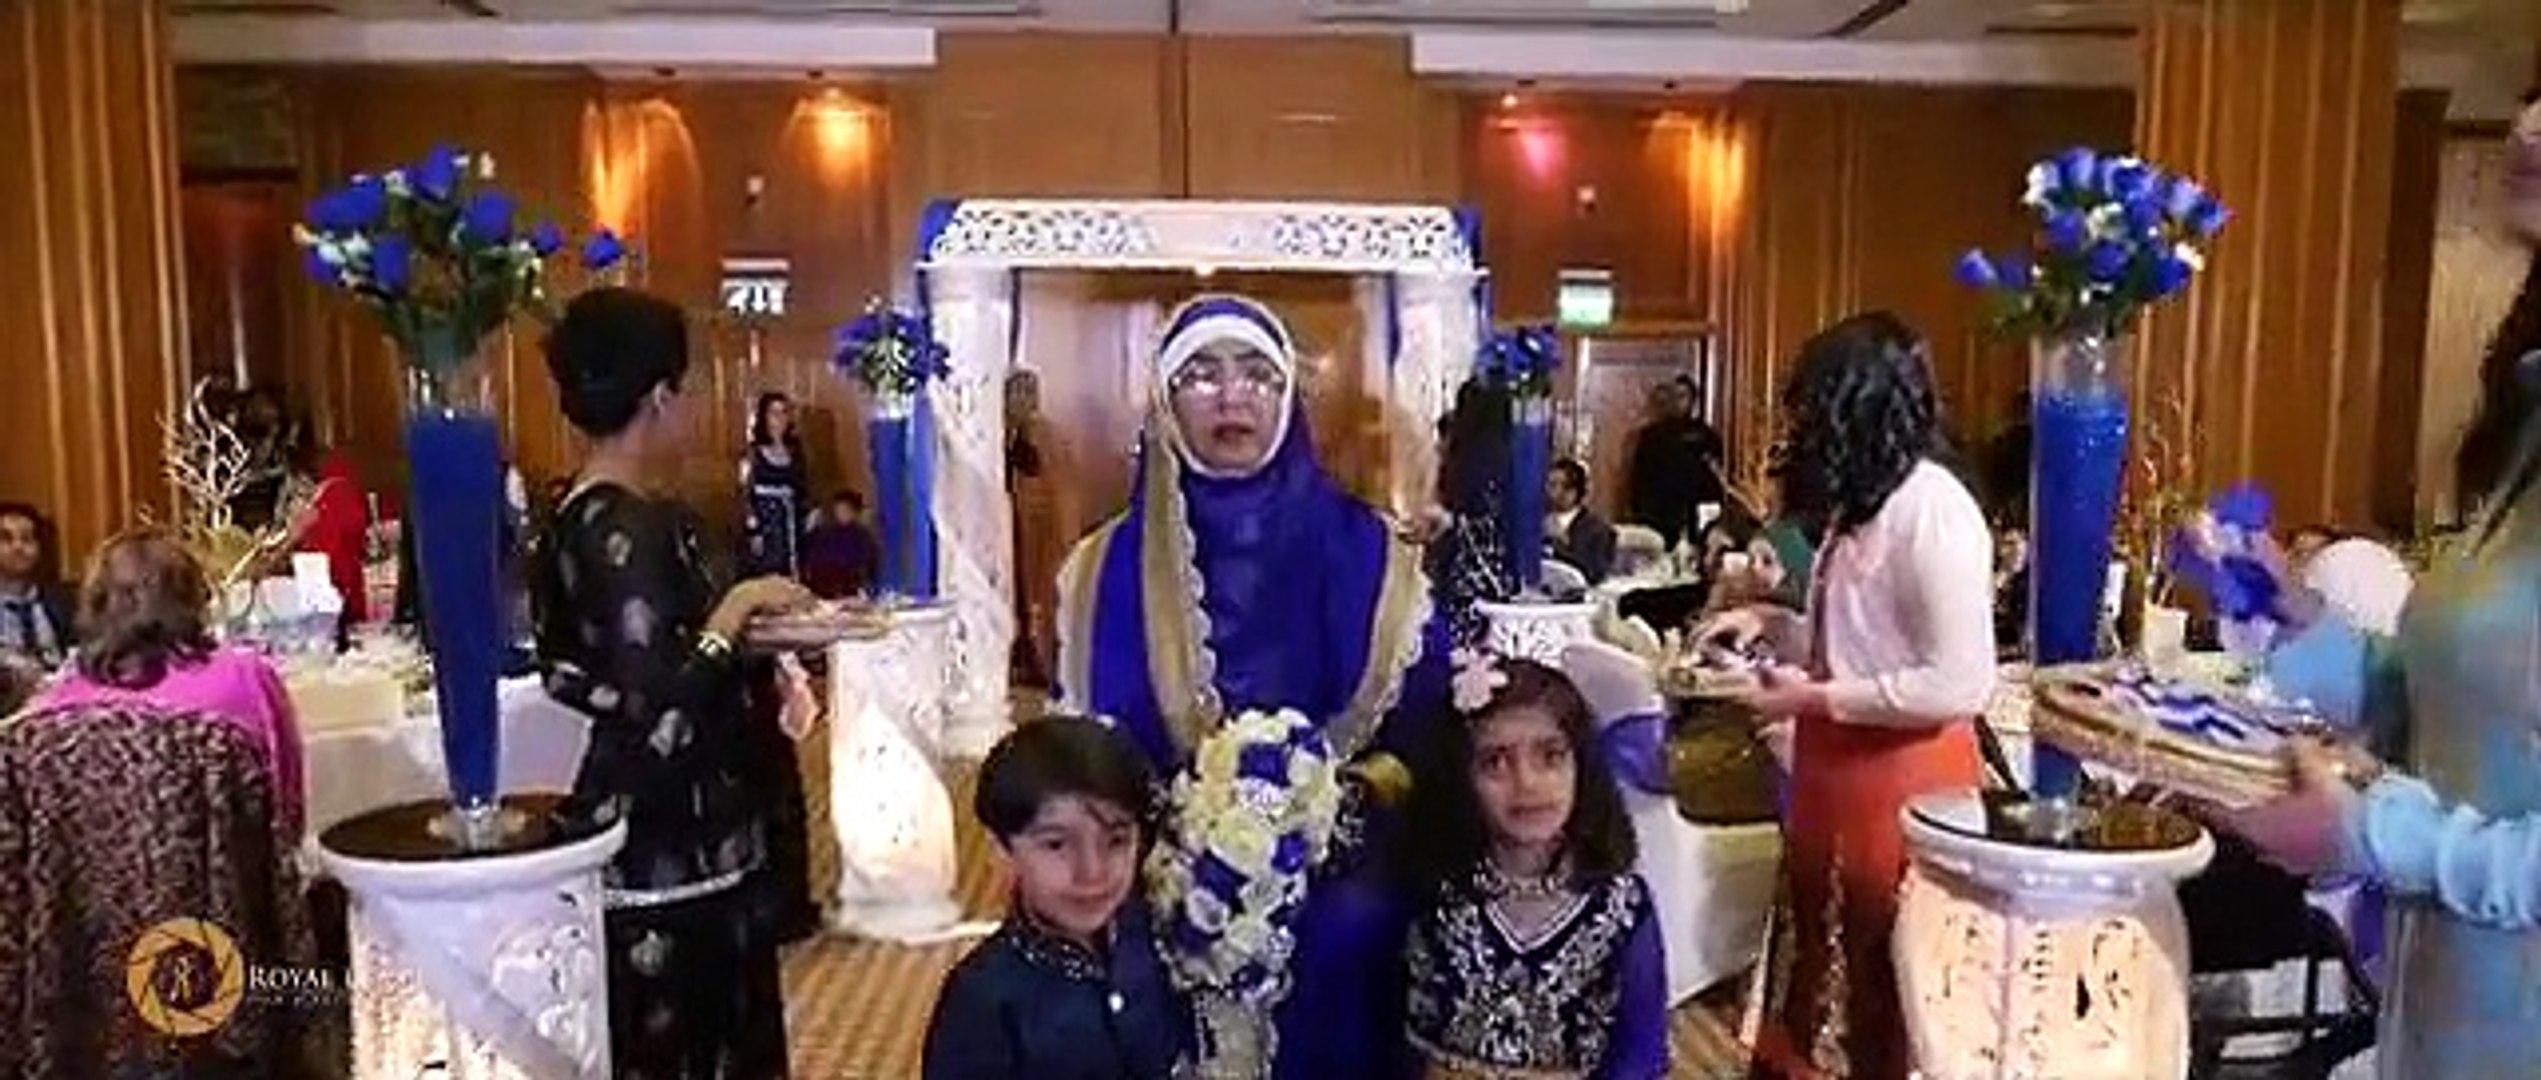 2015 Most Watched Pakistani Wedding Highlight Trailer - Asian Wedding at Hilton London Croydon